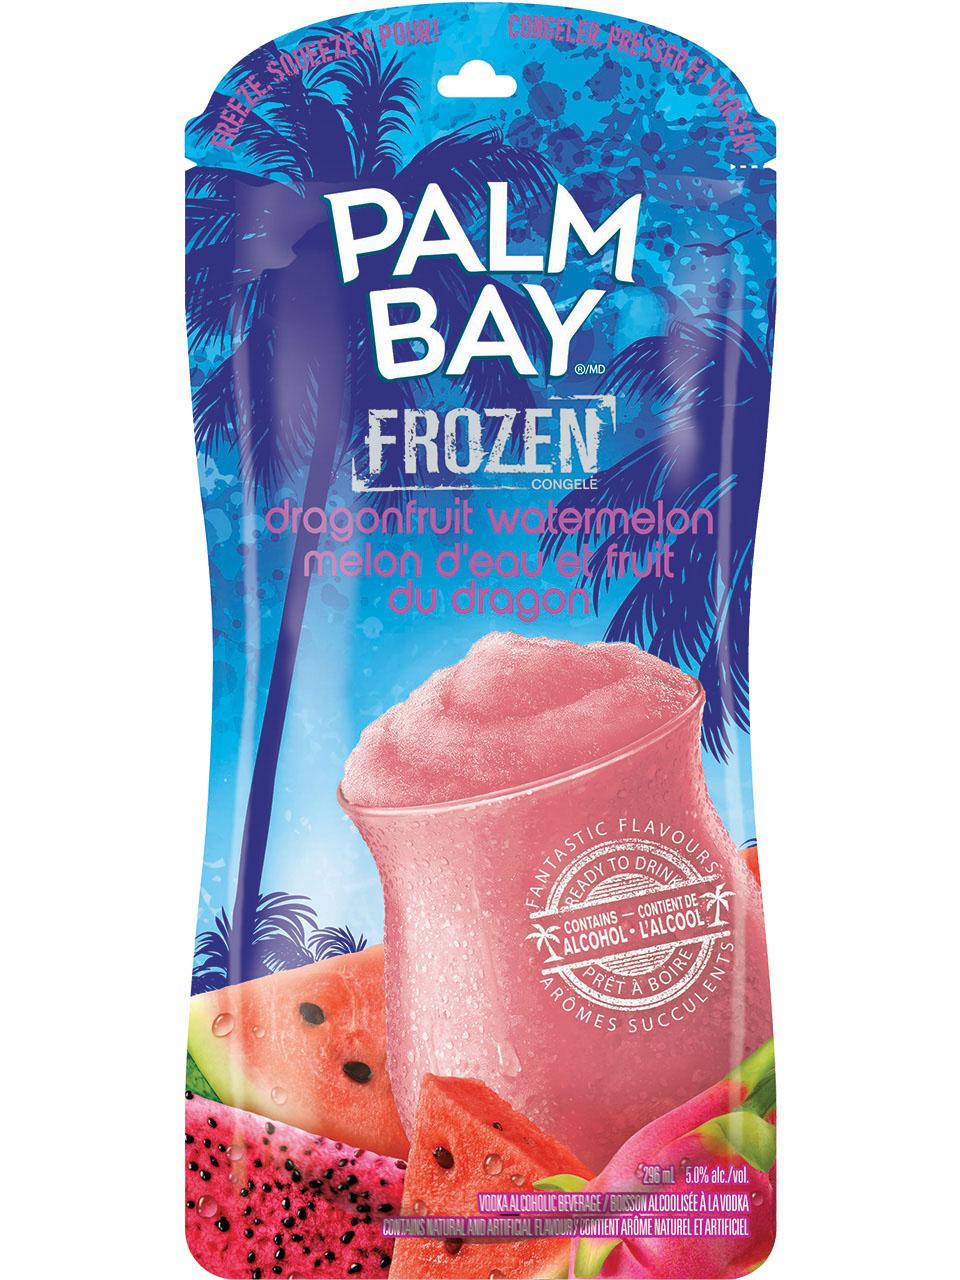 Palm Bay Frozen Dragonfruit Watermelon Pouch